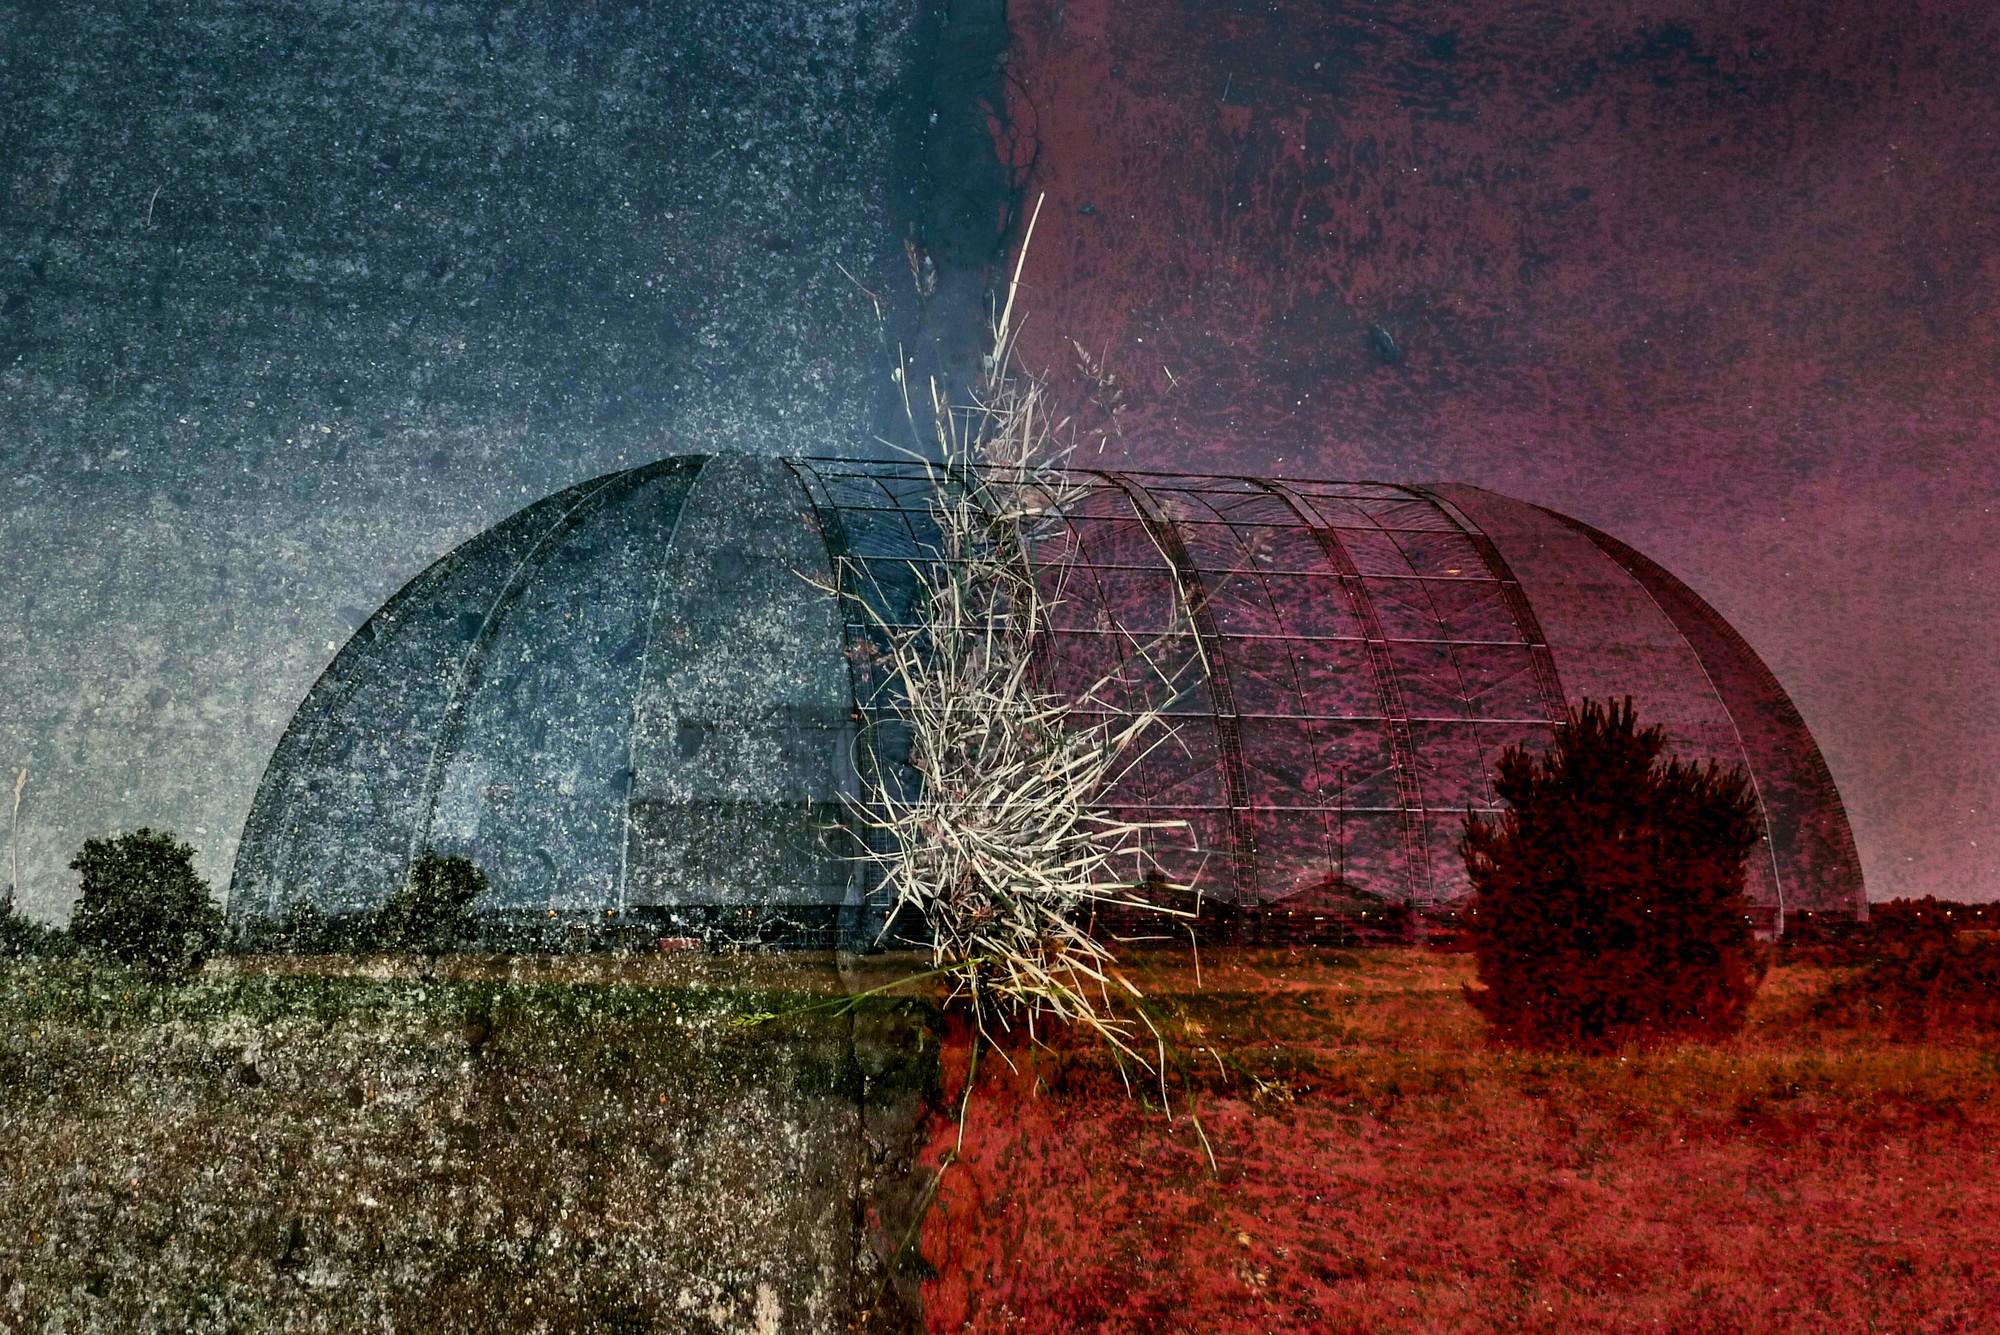 Capsule. Image © Lana Yankovskaya